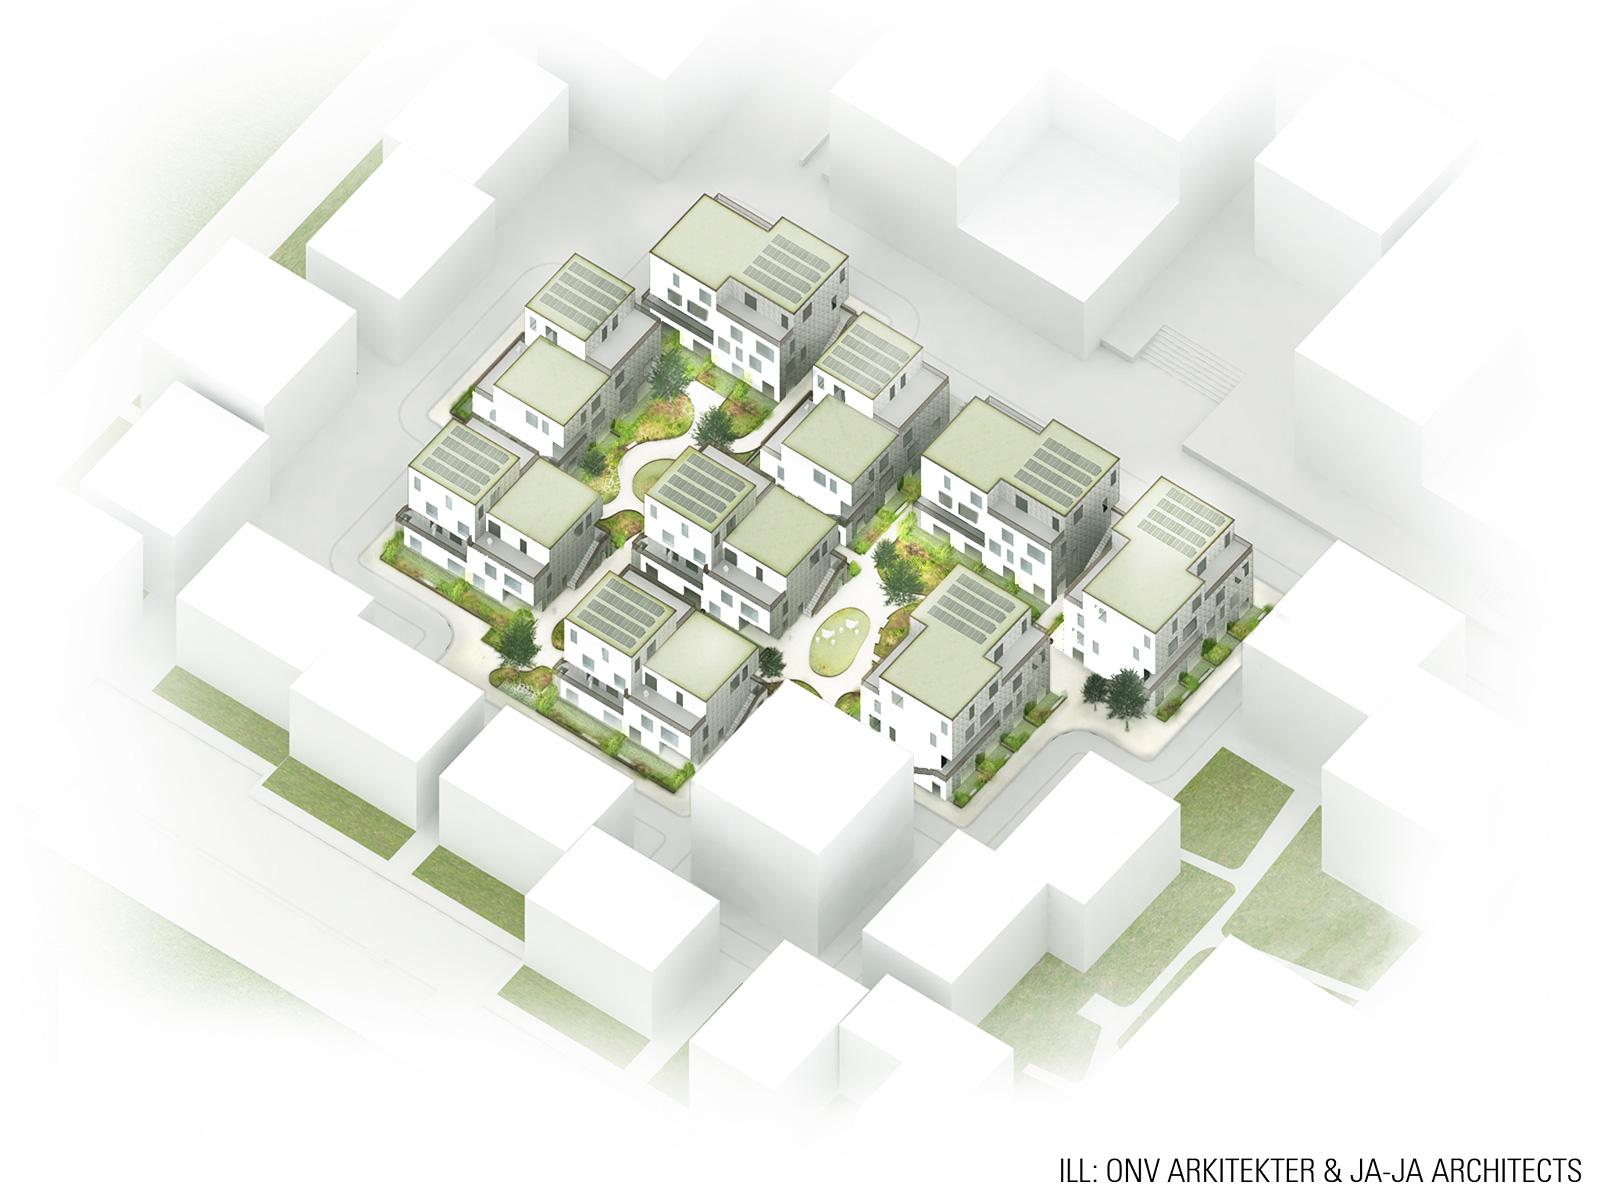 Jaja Amp Onv Architects Win Copenhagen Affordable Housing